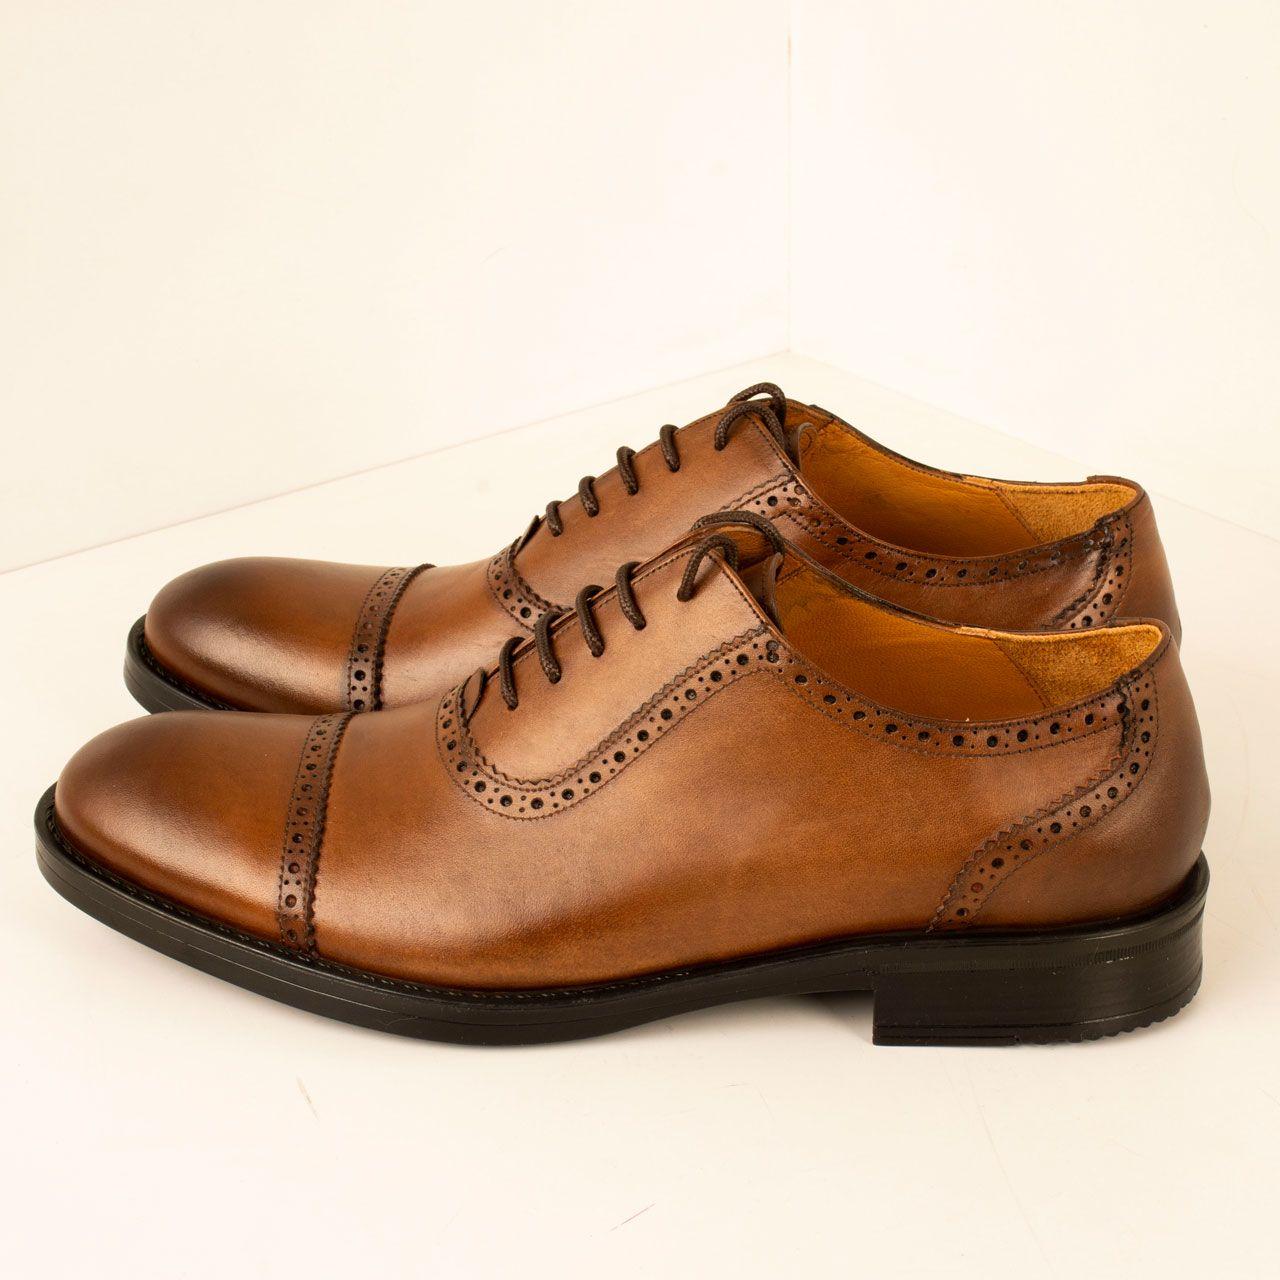 کفش مردانه پارینه چرم مدل SHO182-1 -  - 2